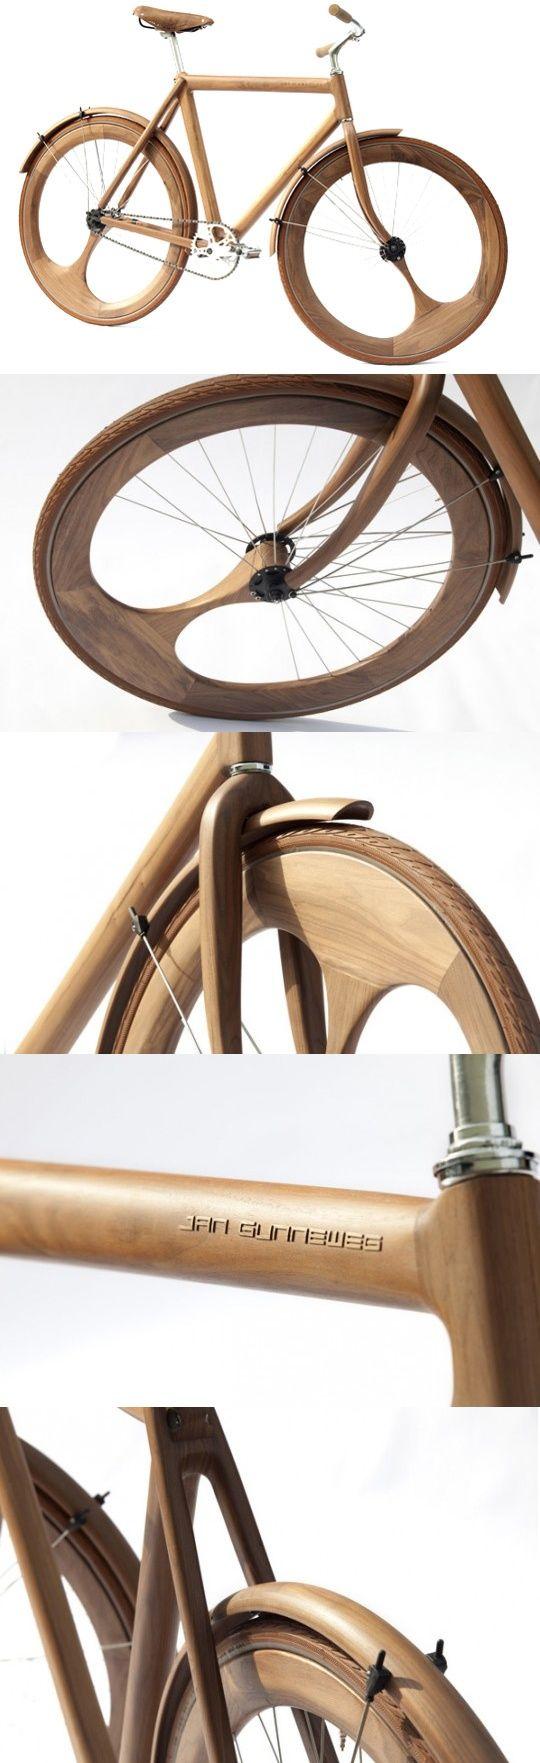 Wooden Bike by Jan Gunneweg...great product : creative & beautiful ;)